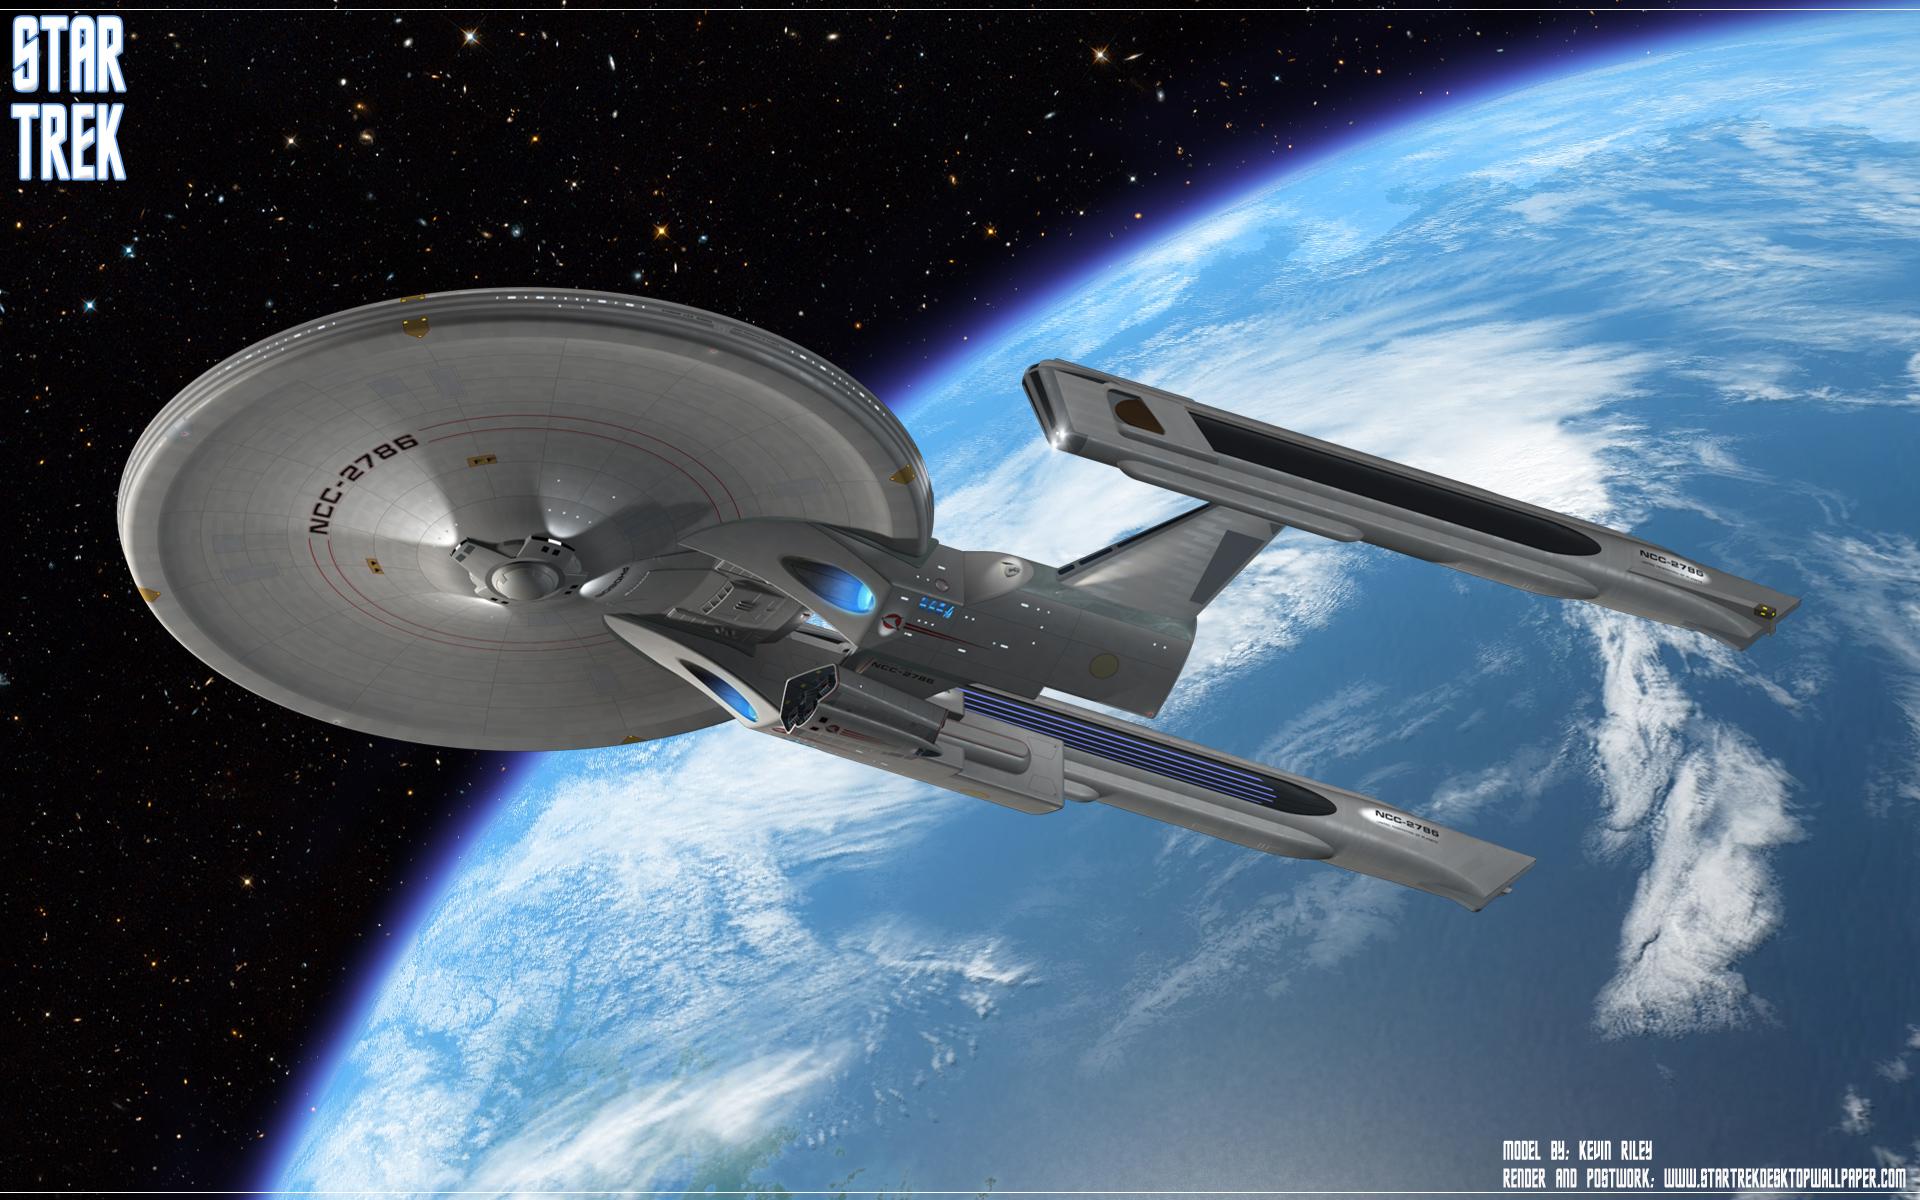 Star Trek Uss Phobos wallpaper   910773 1920x1200